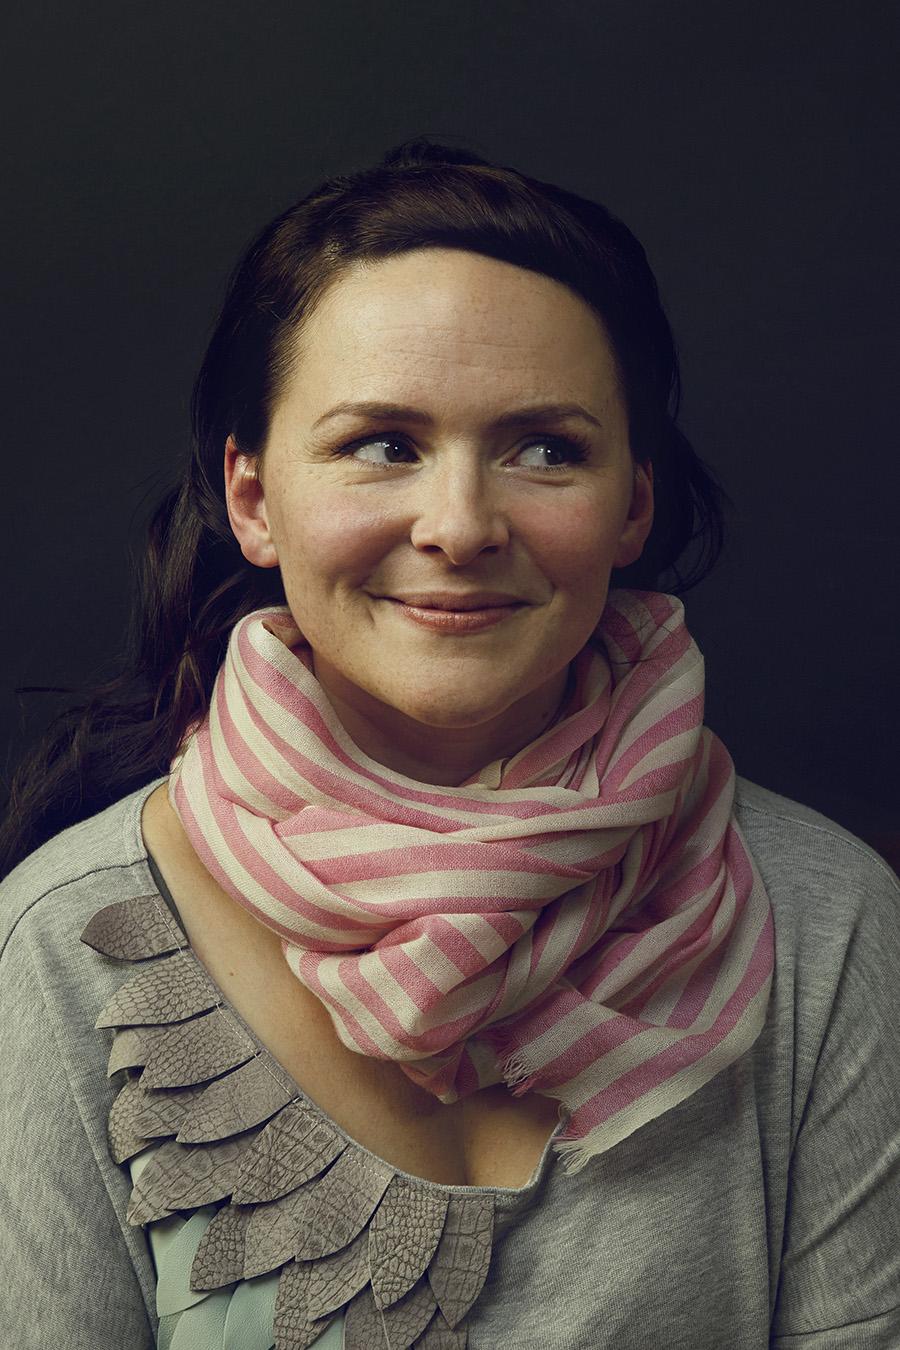 Emiliana Torrini - Rolling Stone